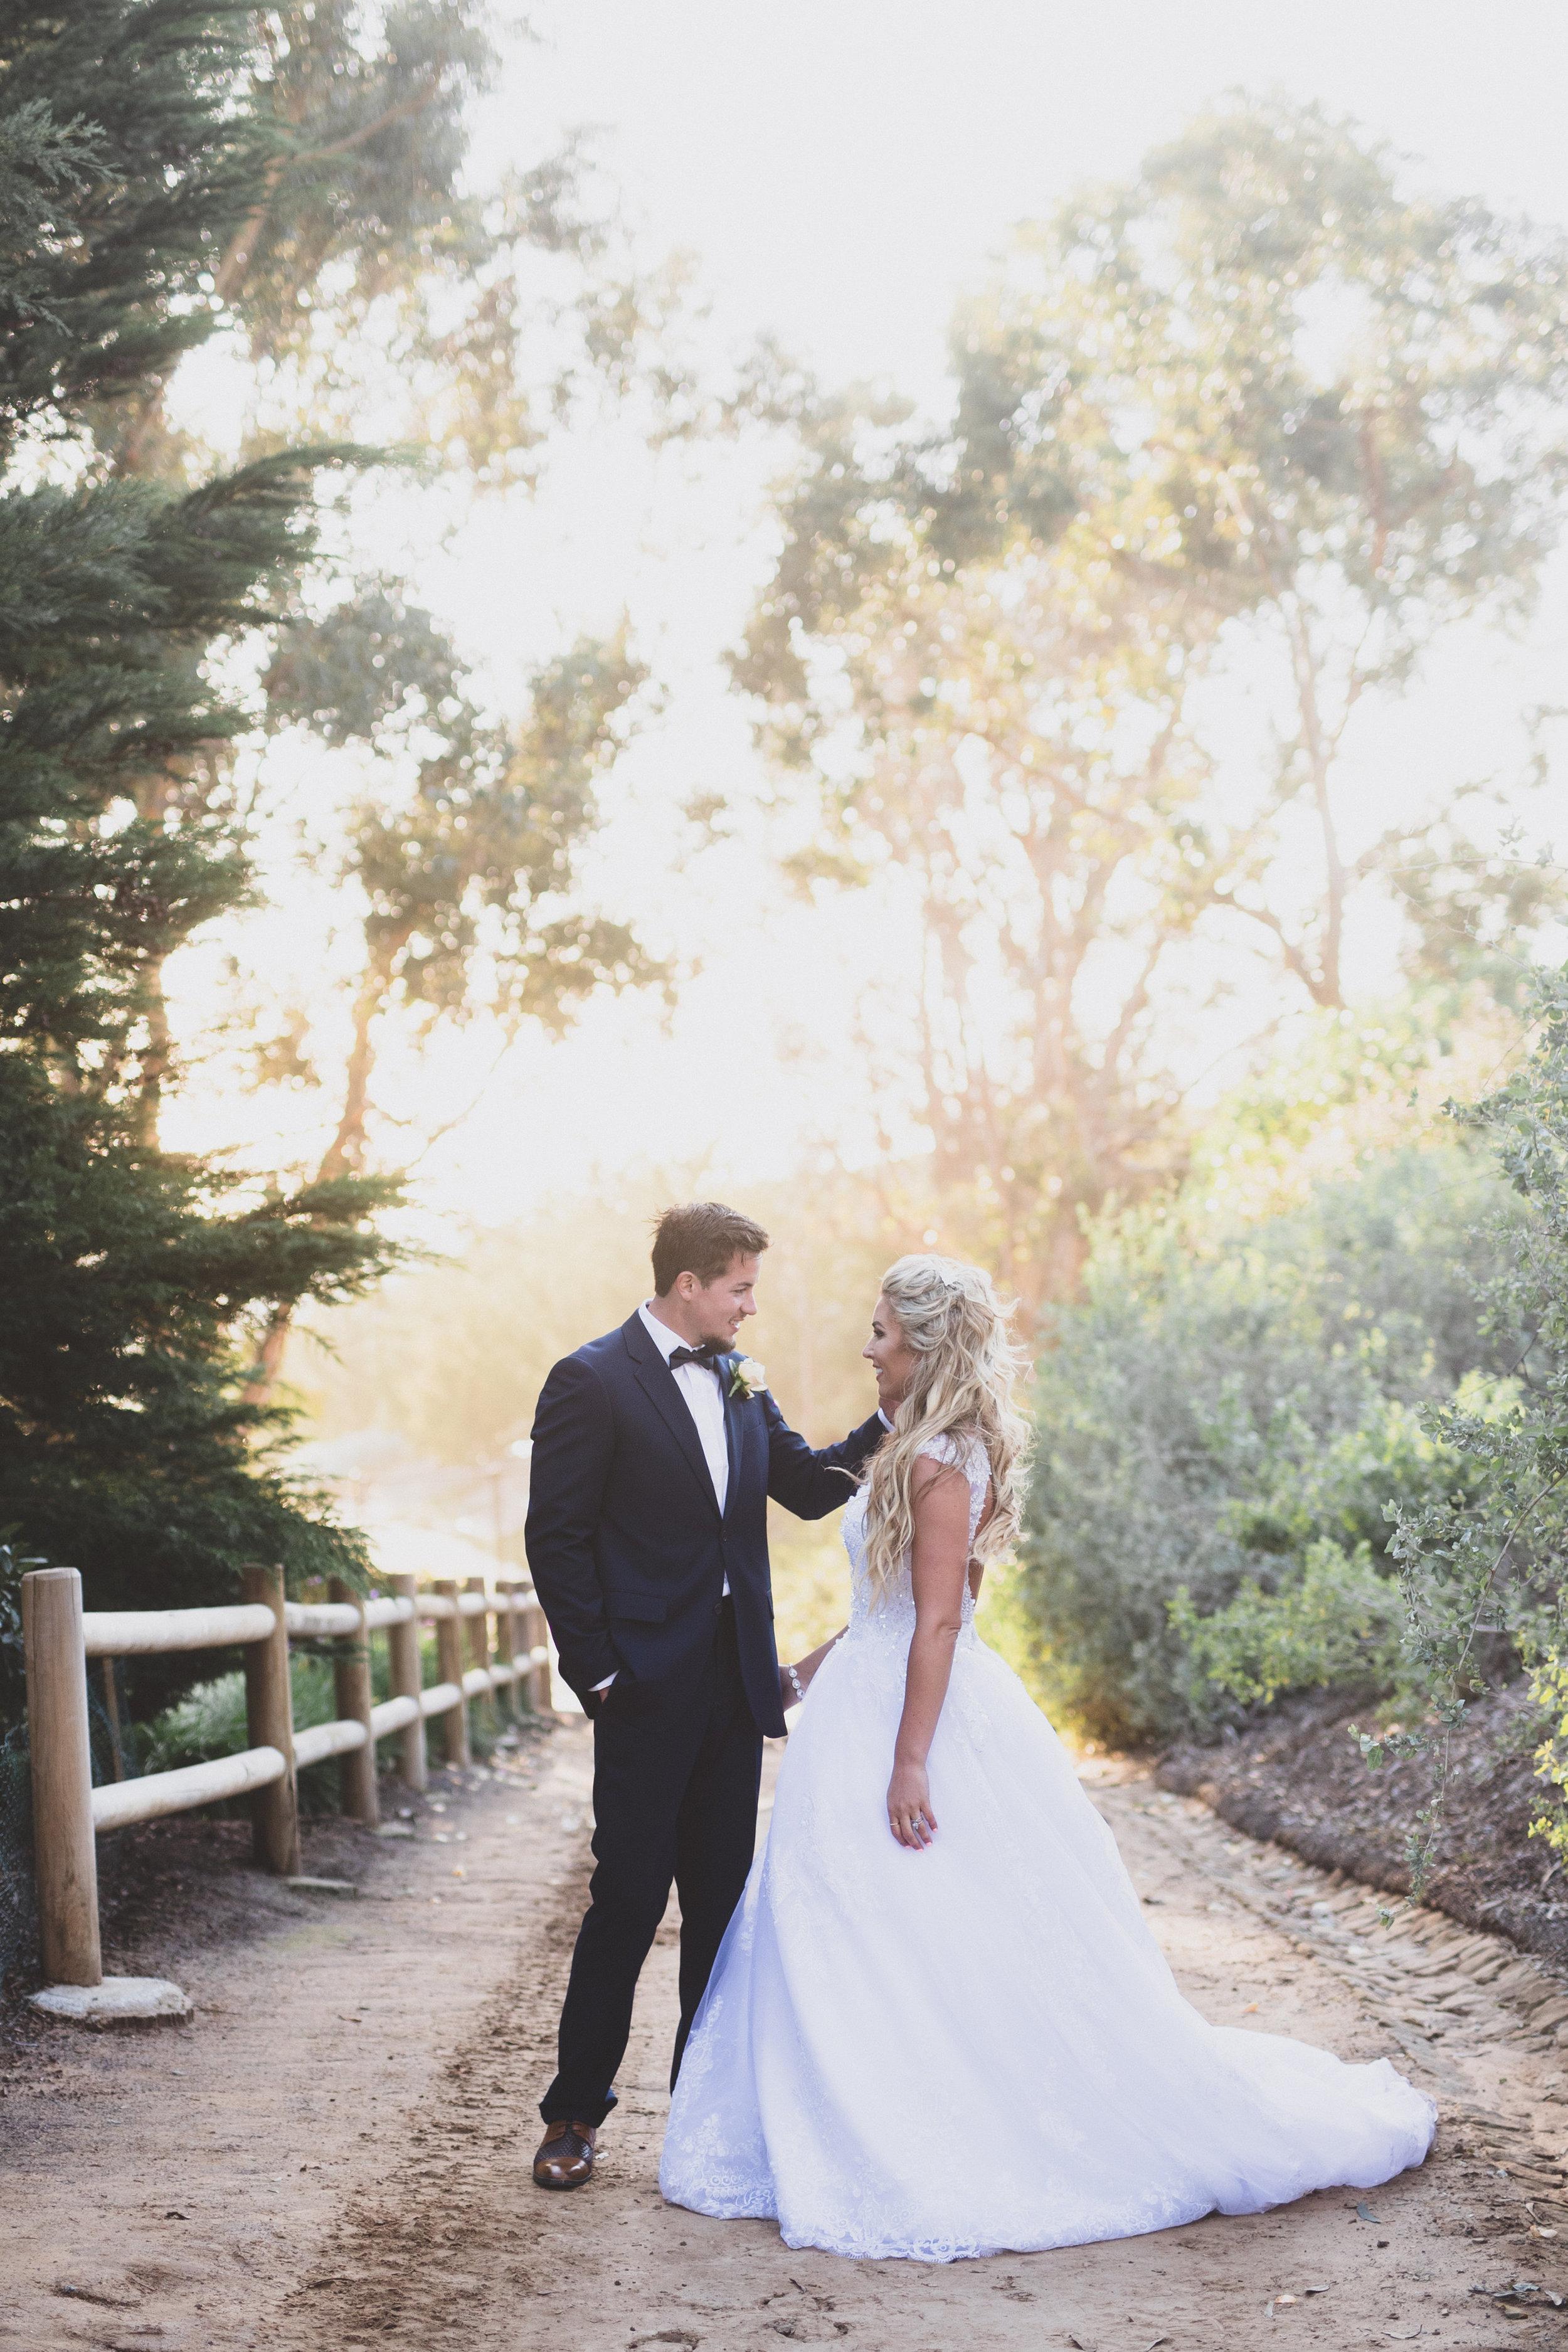 Holly and Ricky Wedding-HollyandRicky-0212.jpg